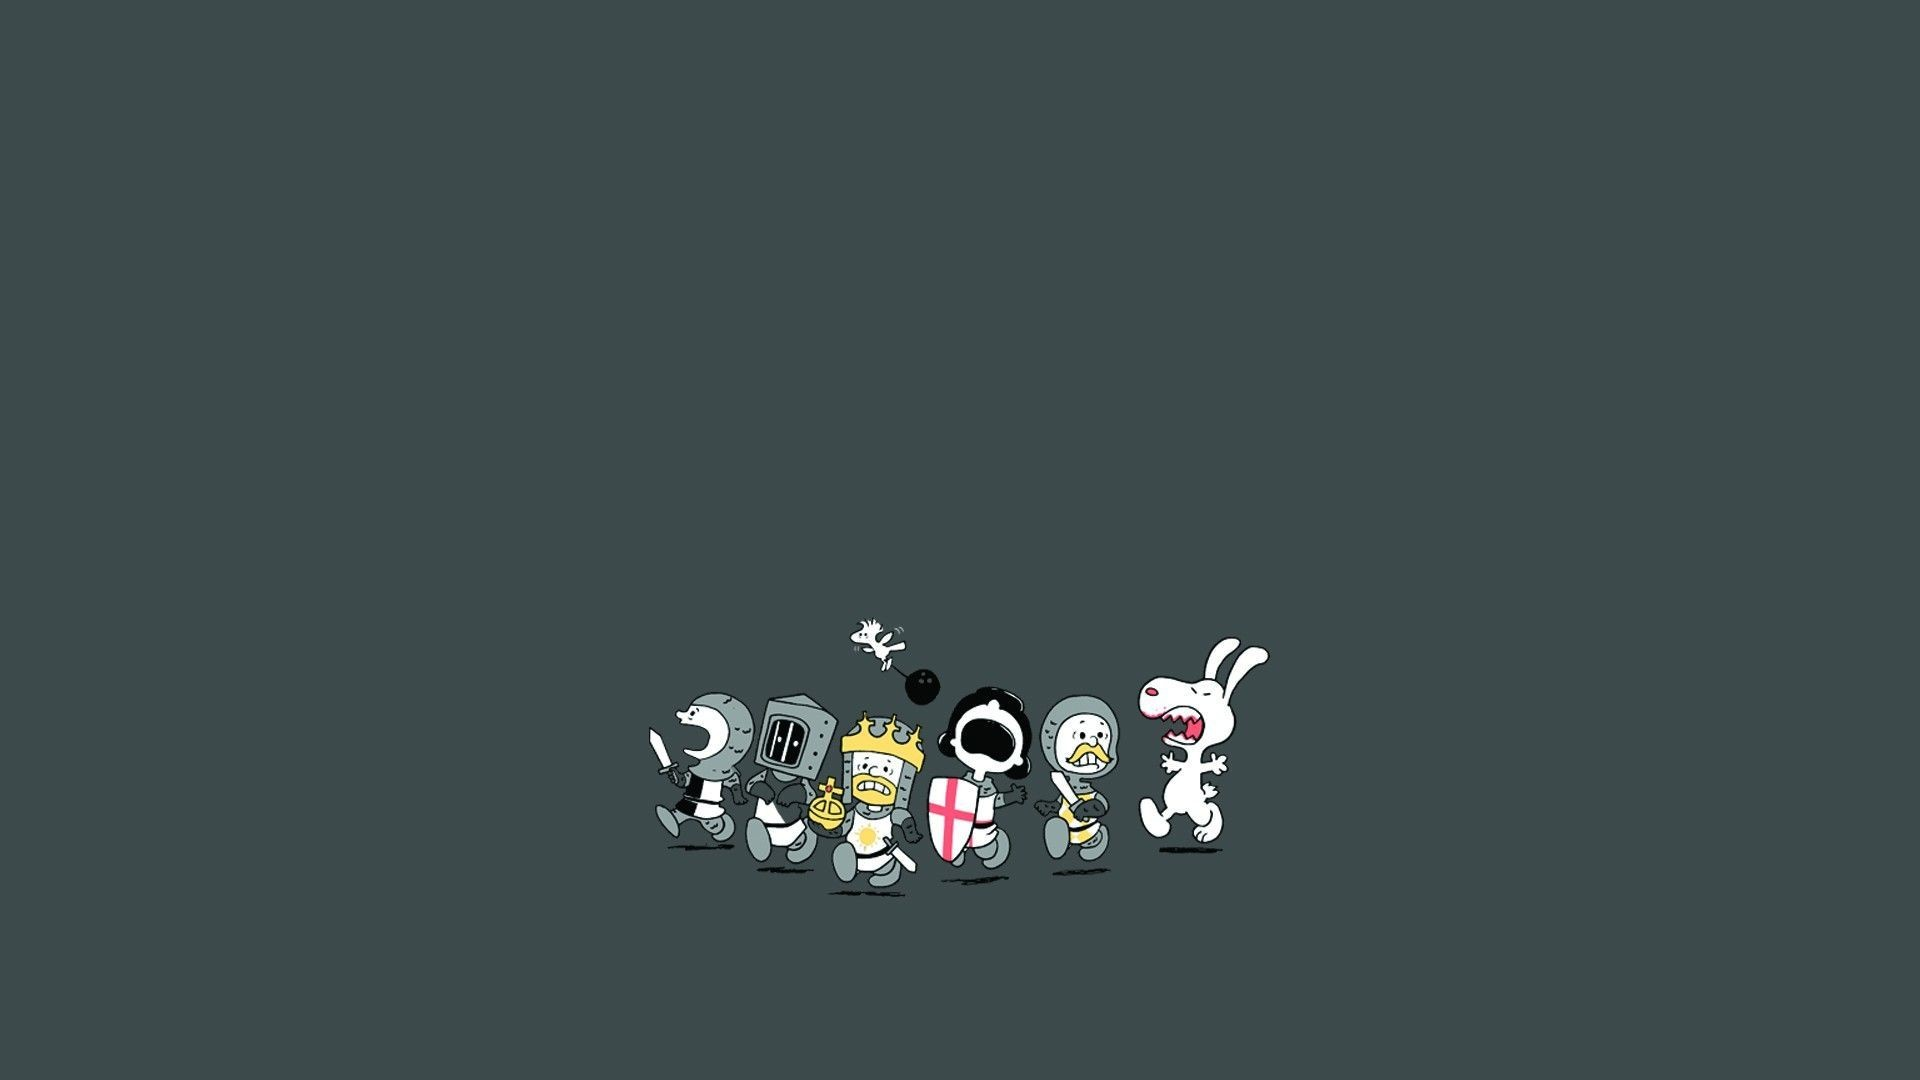 Peanuts Easter Wallpaper for Desktop 57 images 1920x1080